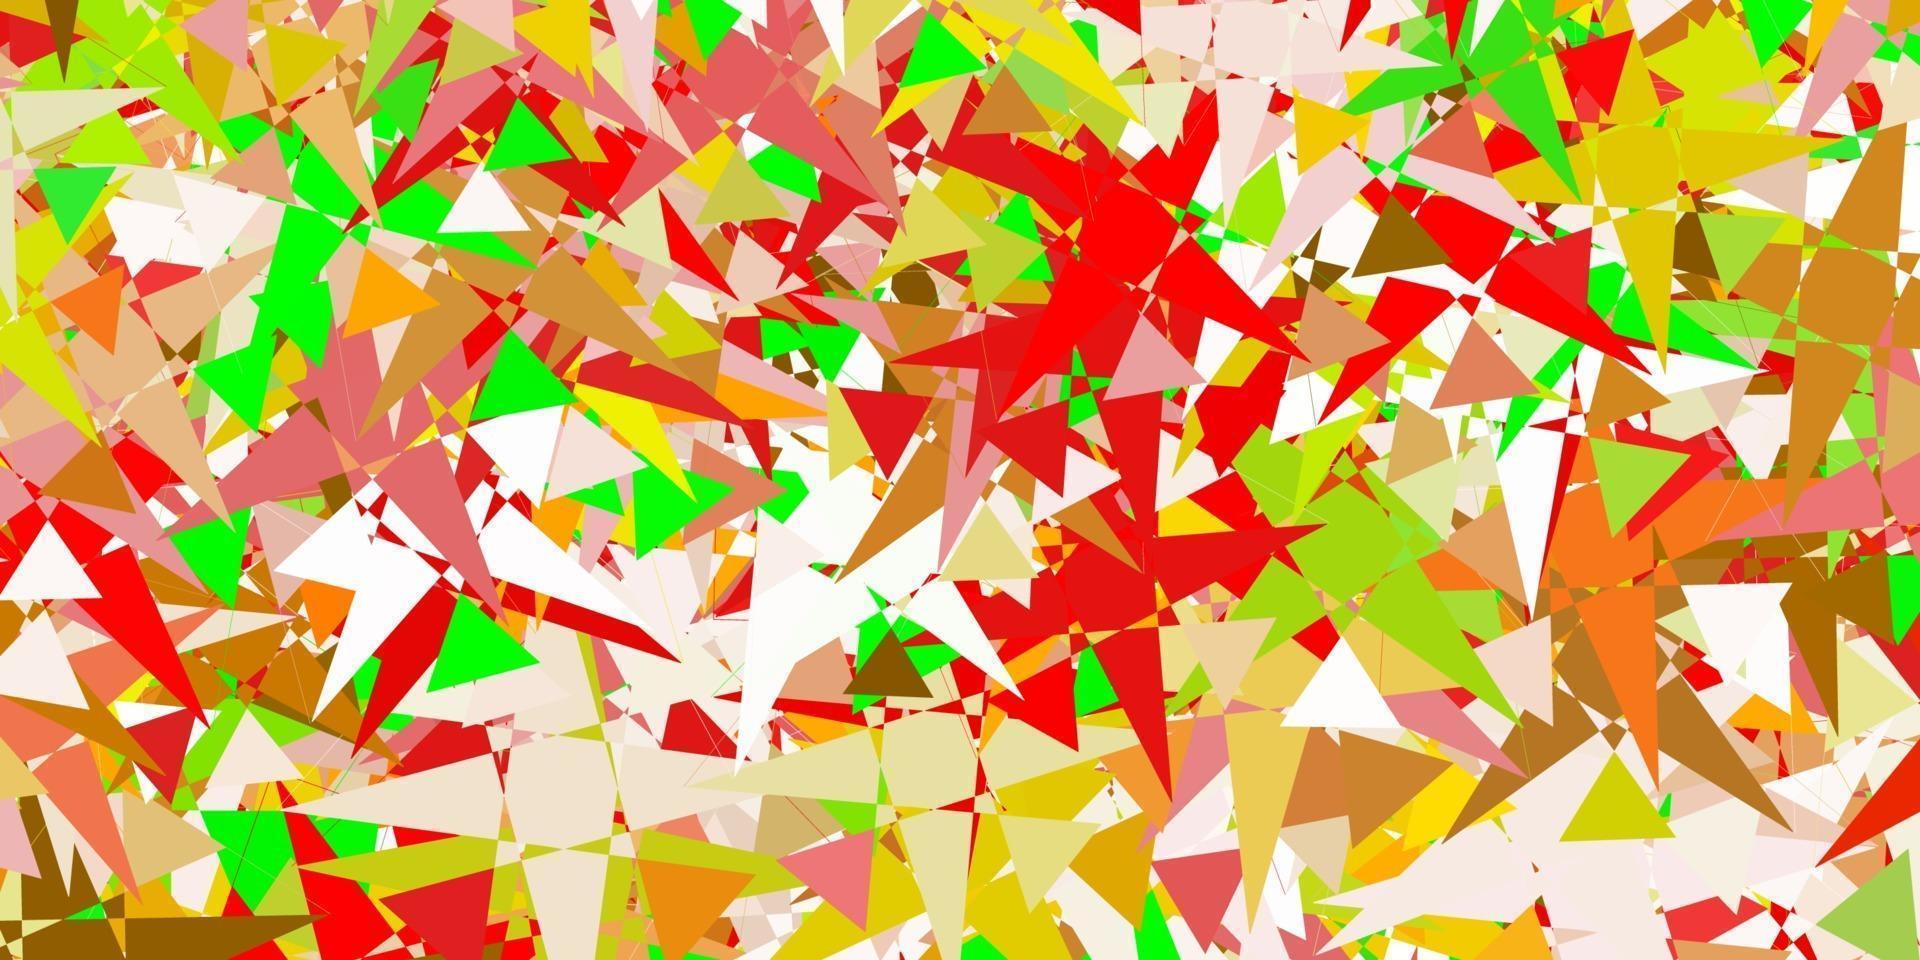 hellrosa, grüne Vektorschablone mit Dreiecksformen. vektor